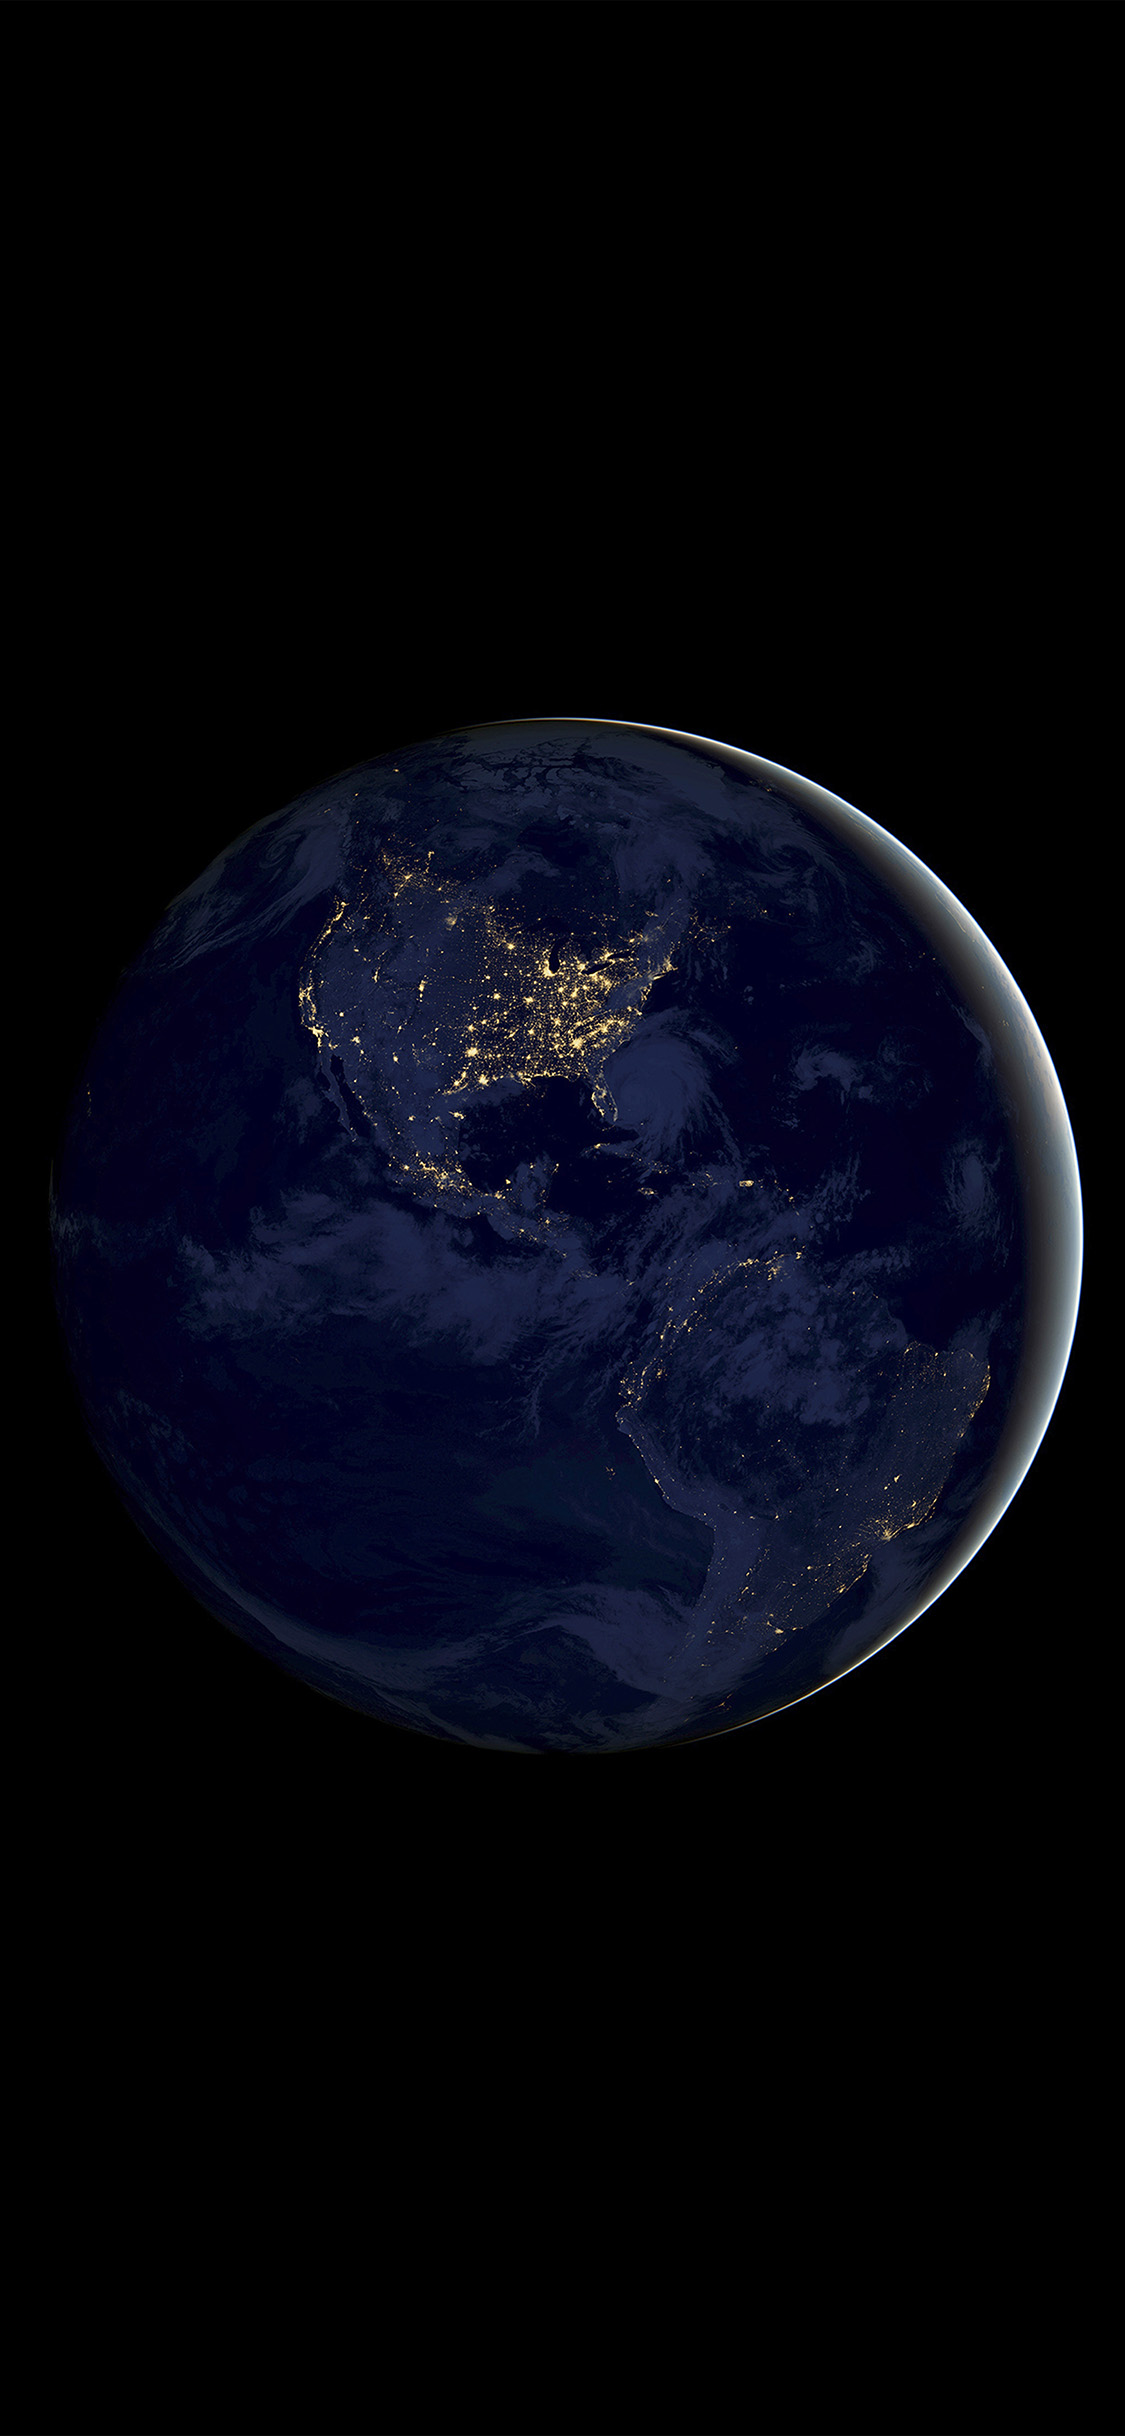 iPhonexpapers.com-Apple-iPhone-wallpaper-bd20-earth-space-dark-night-art-illustration